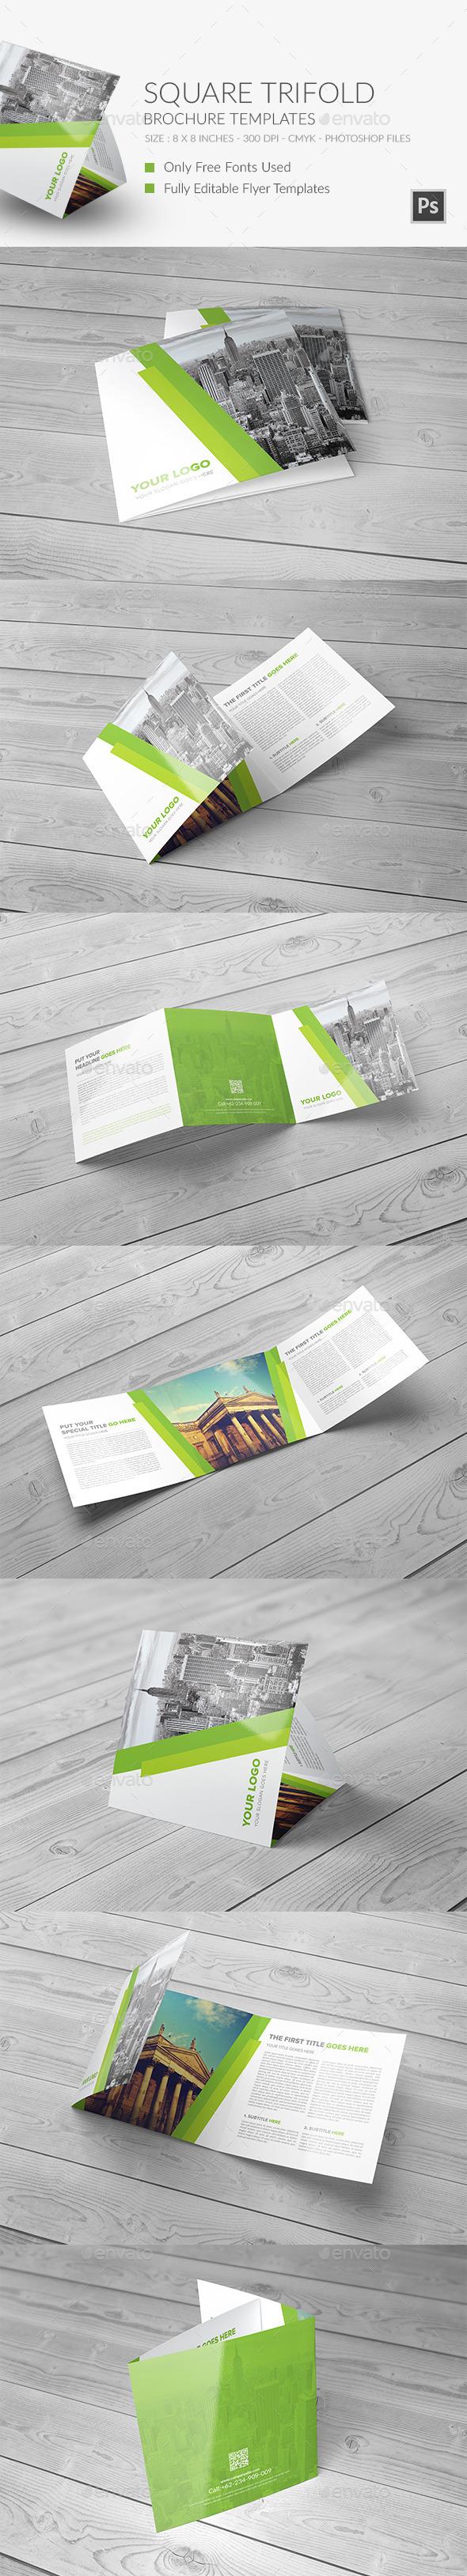 Square Trifold Brochure vol 1 - Brochures Print Templates